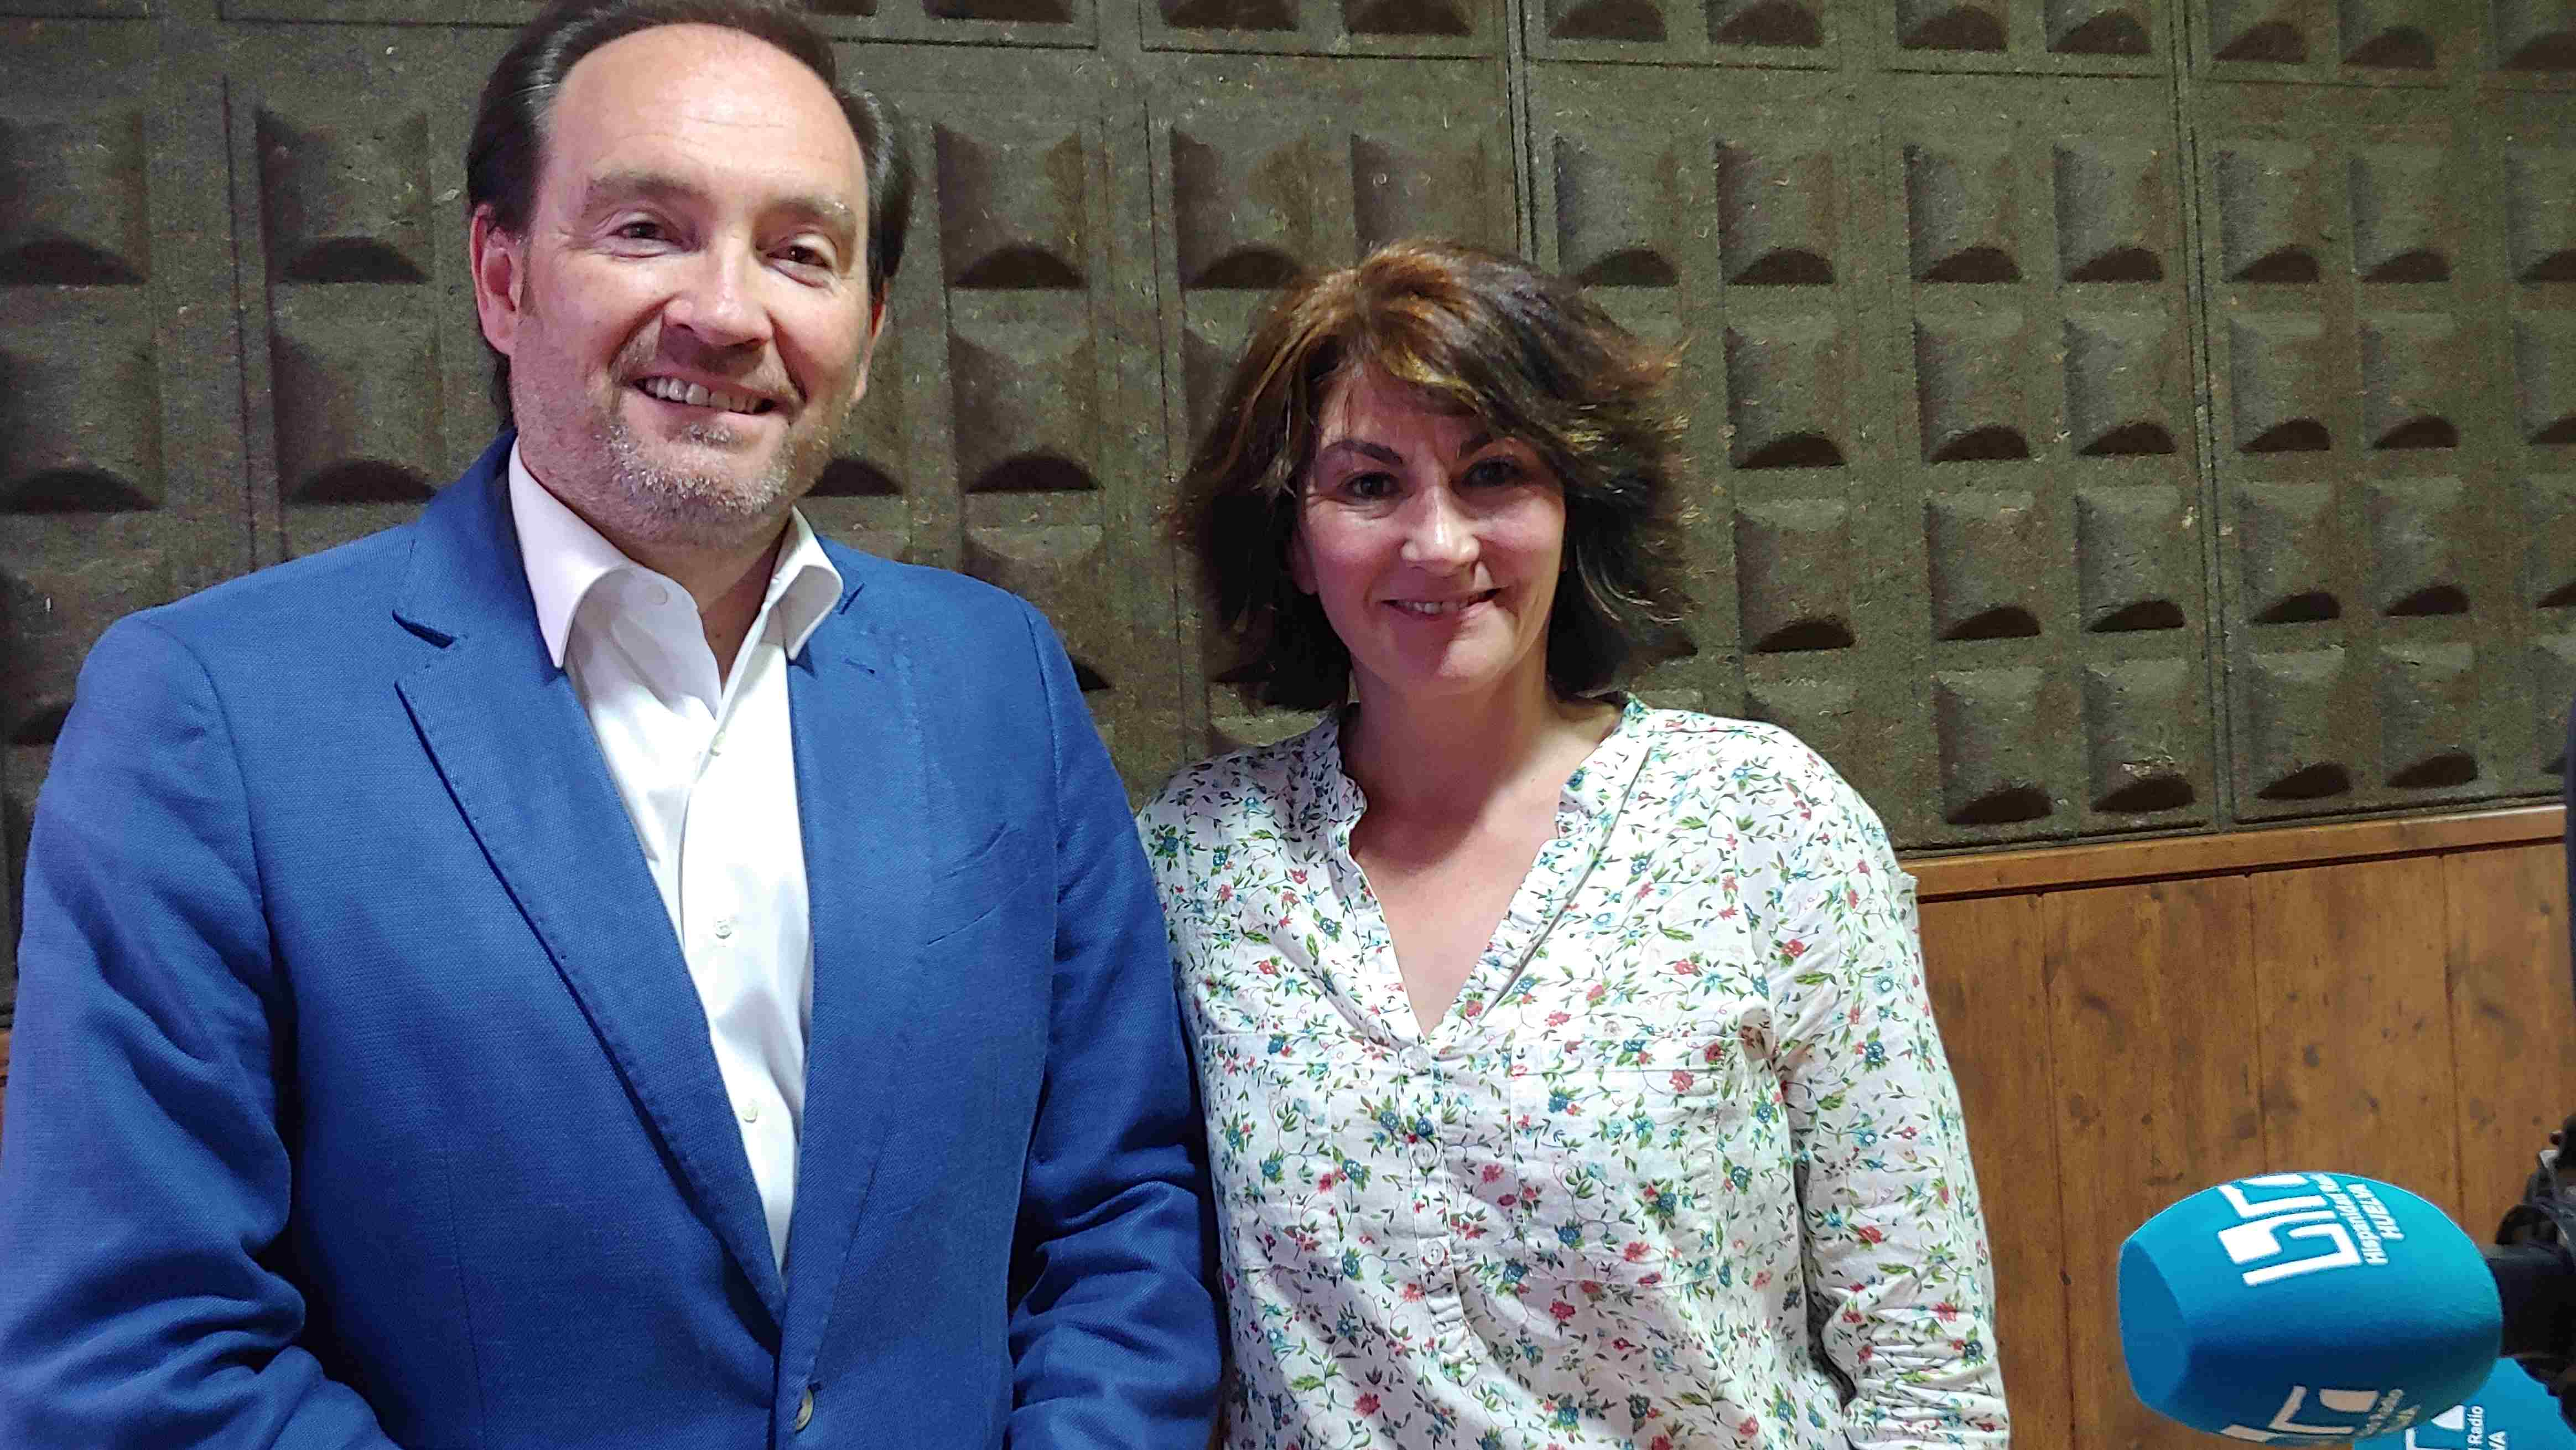 Queremos Saber 10-05-2019 José Fernádez Nº3 en la lista PSOE  en la capital